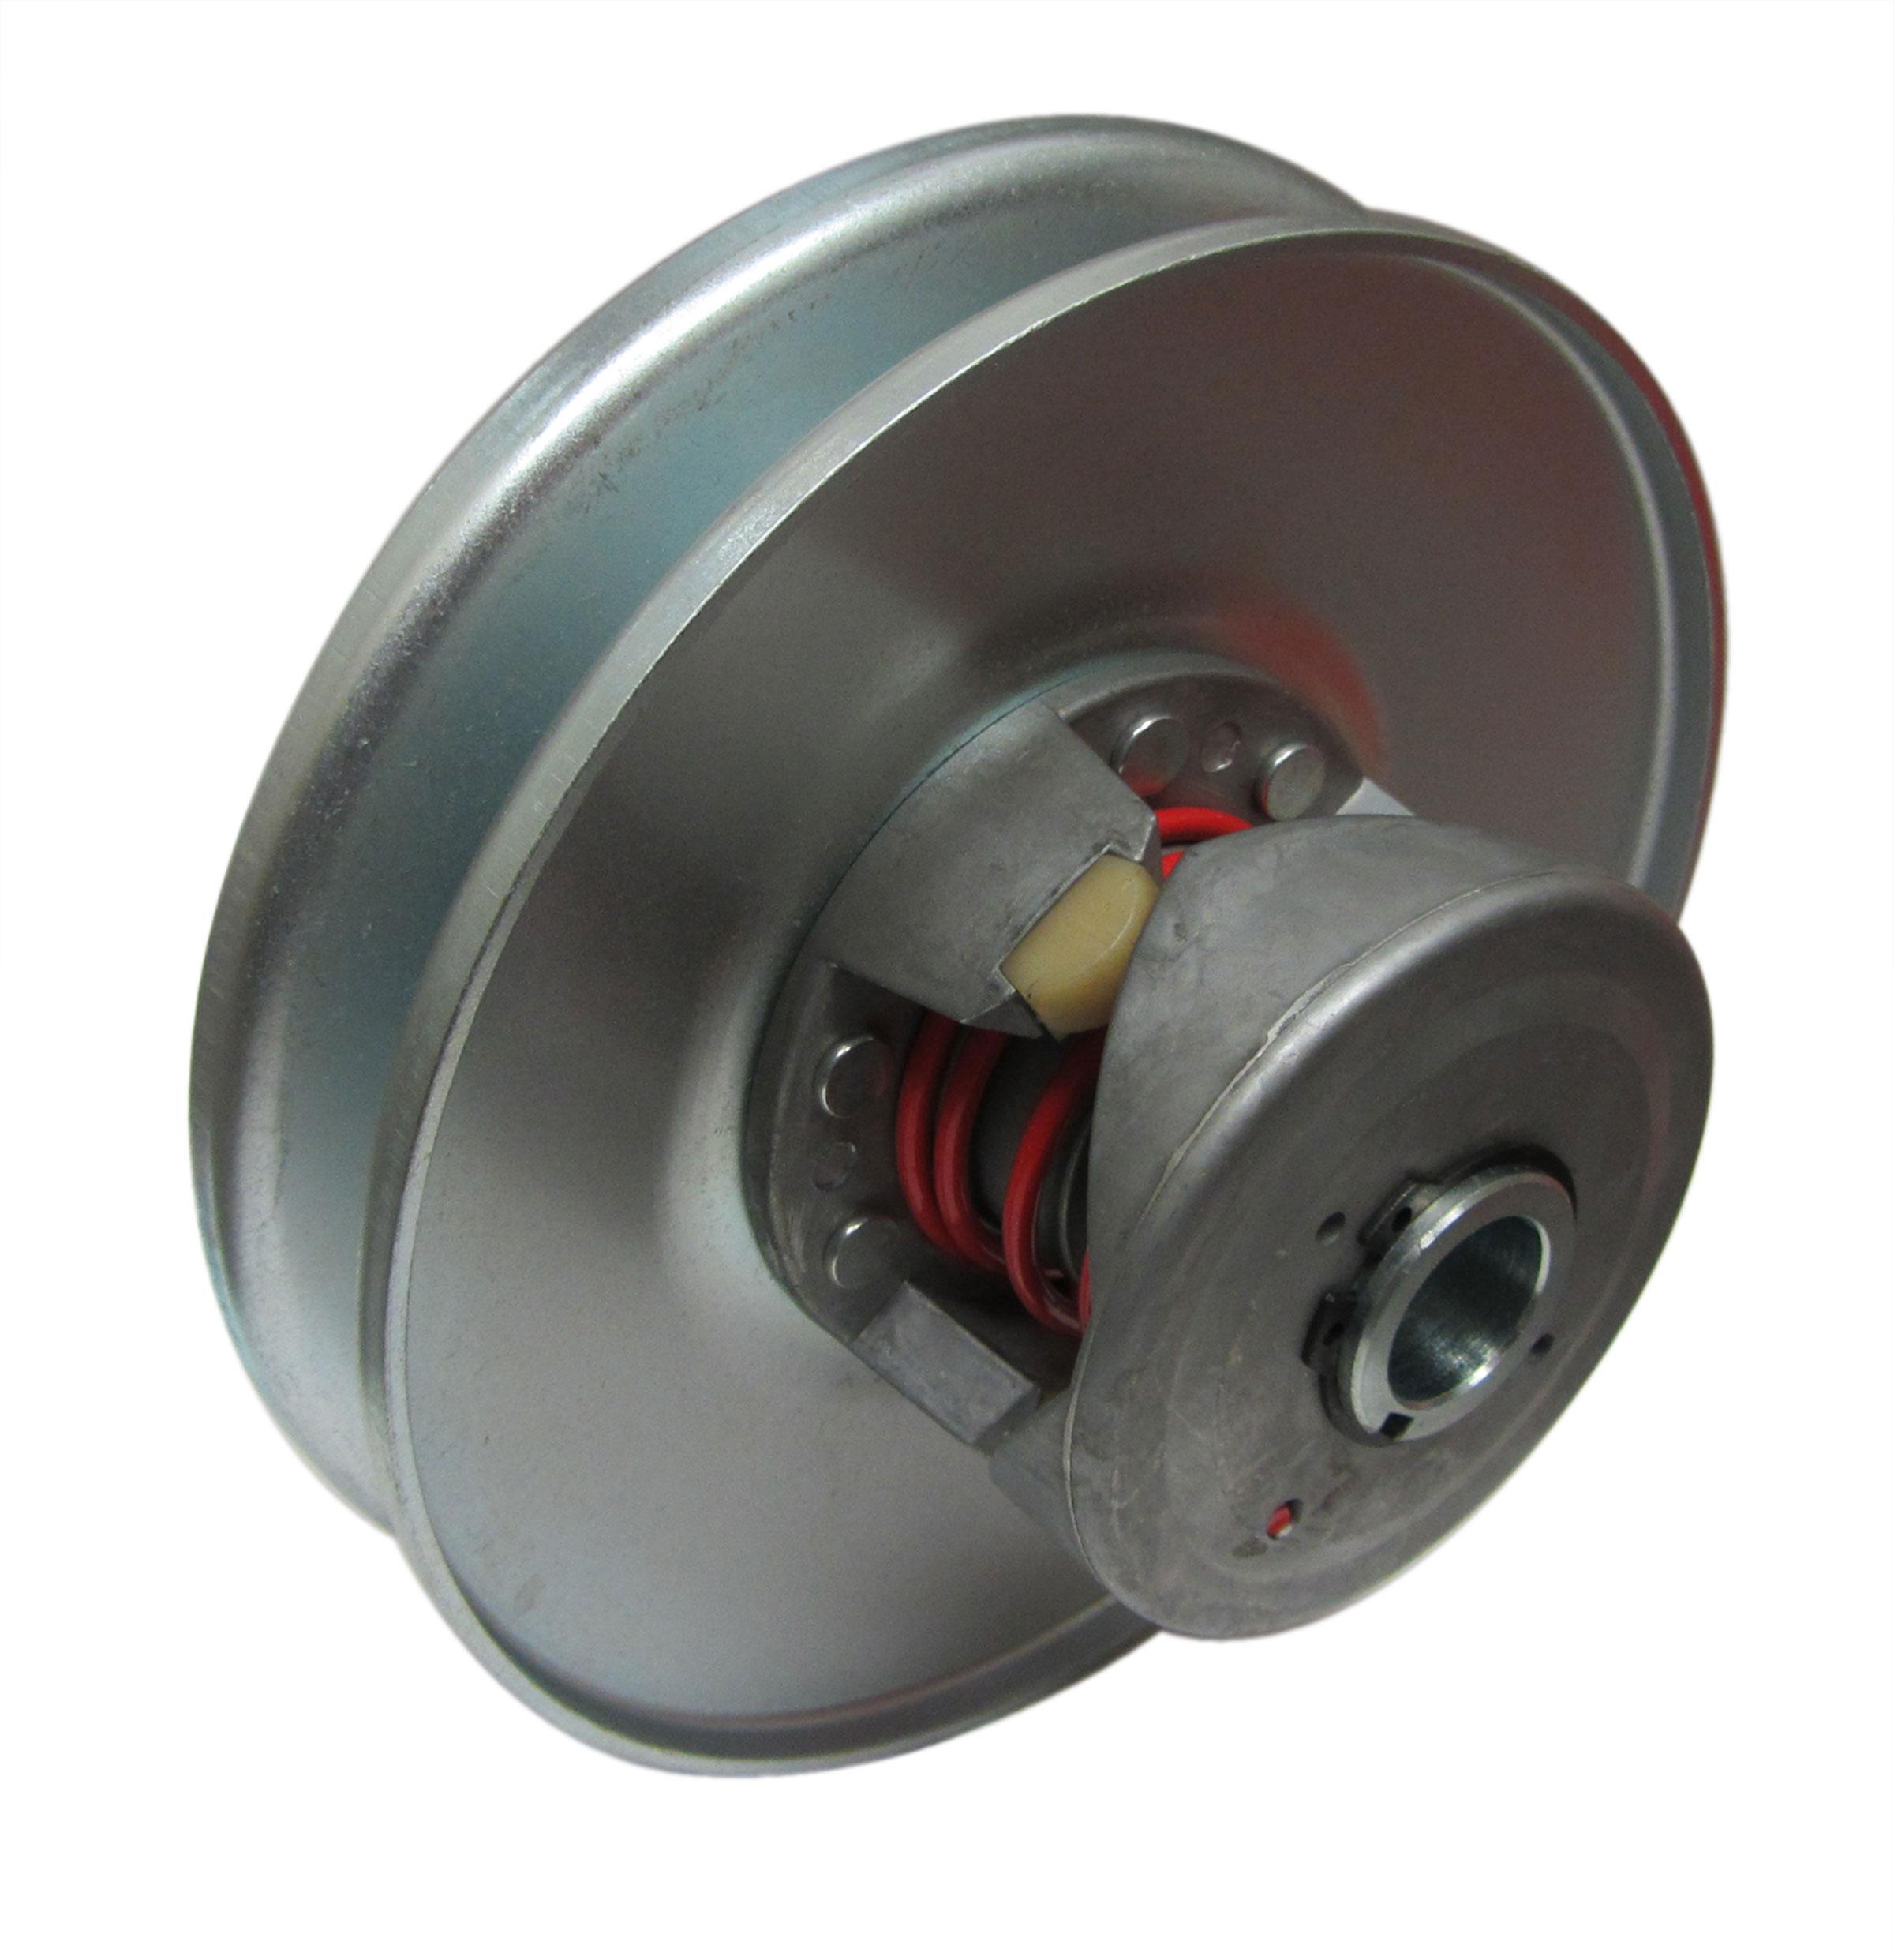 40 Series Torque Converter Driven 7 8 Bore 464778 Bmi Karts Rear Swingarm Diagram And Parts List For Manco Gokartminibikeparts Zoom